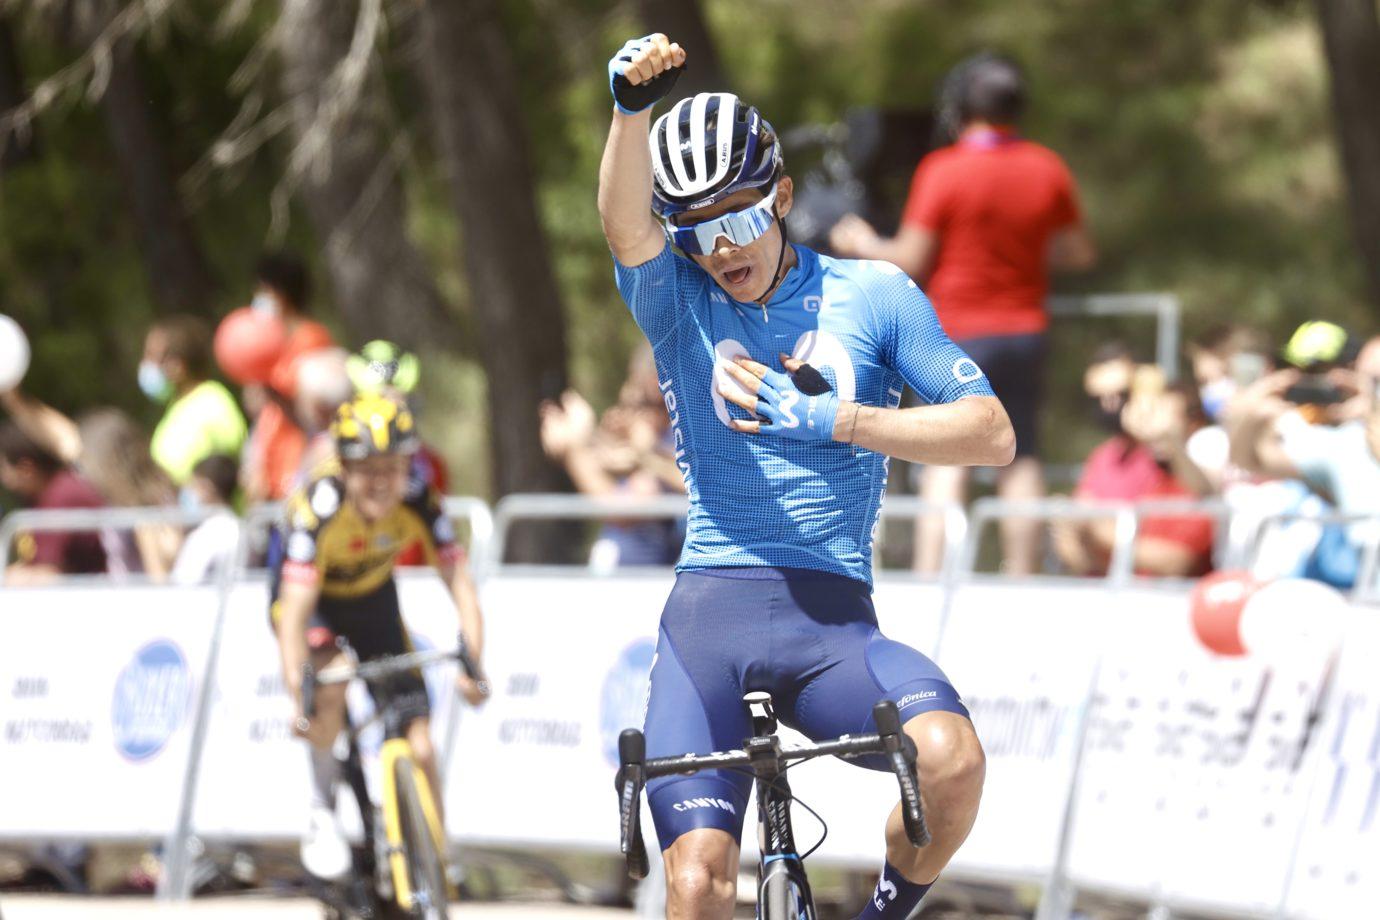 News' image'Miguel Ángel López ya gana con Movistar Team'